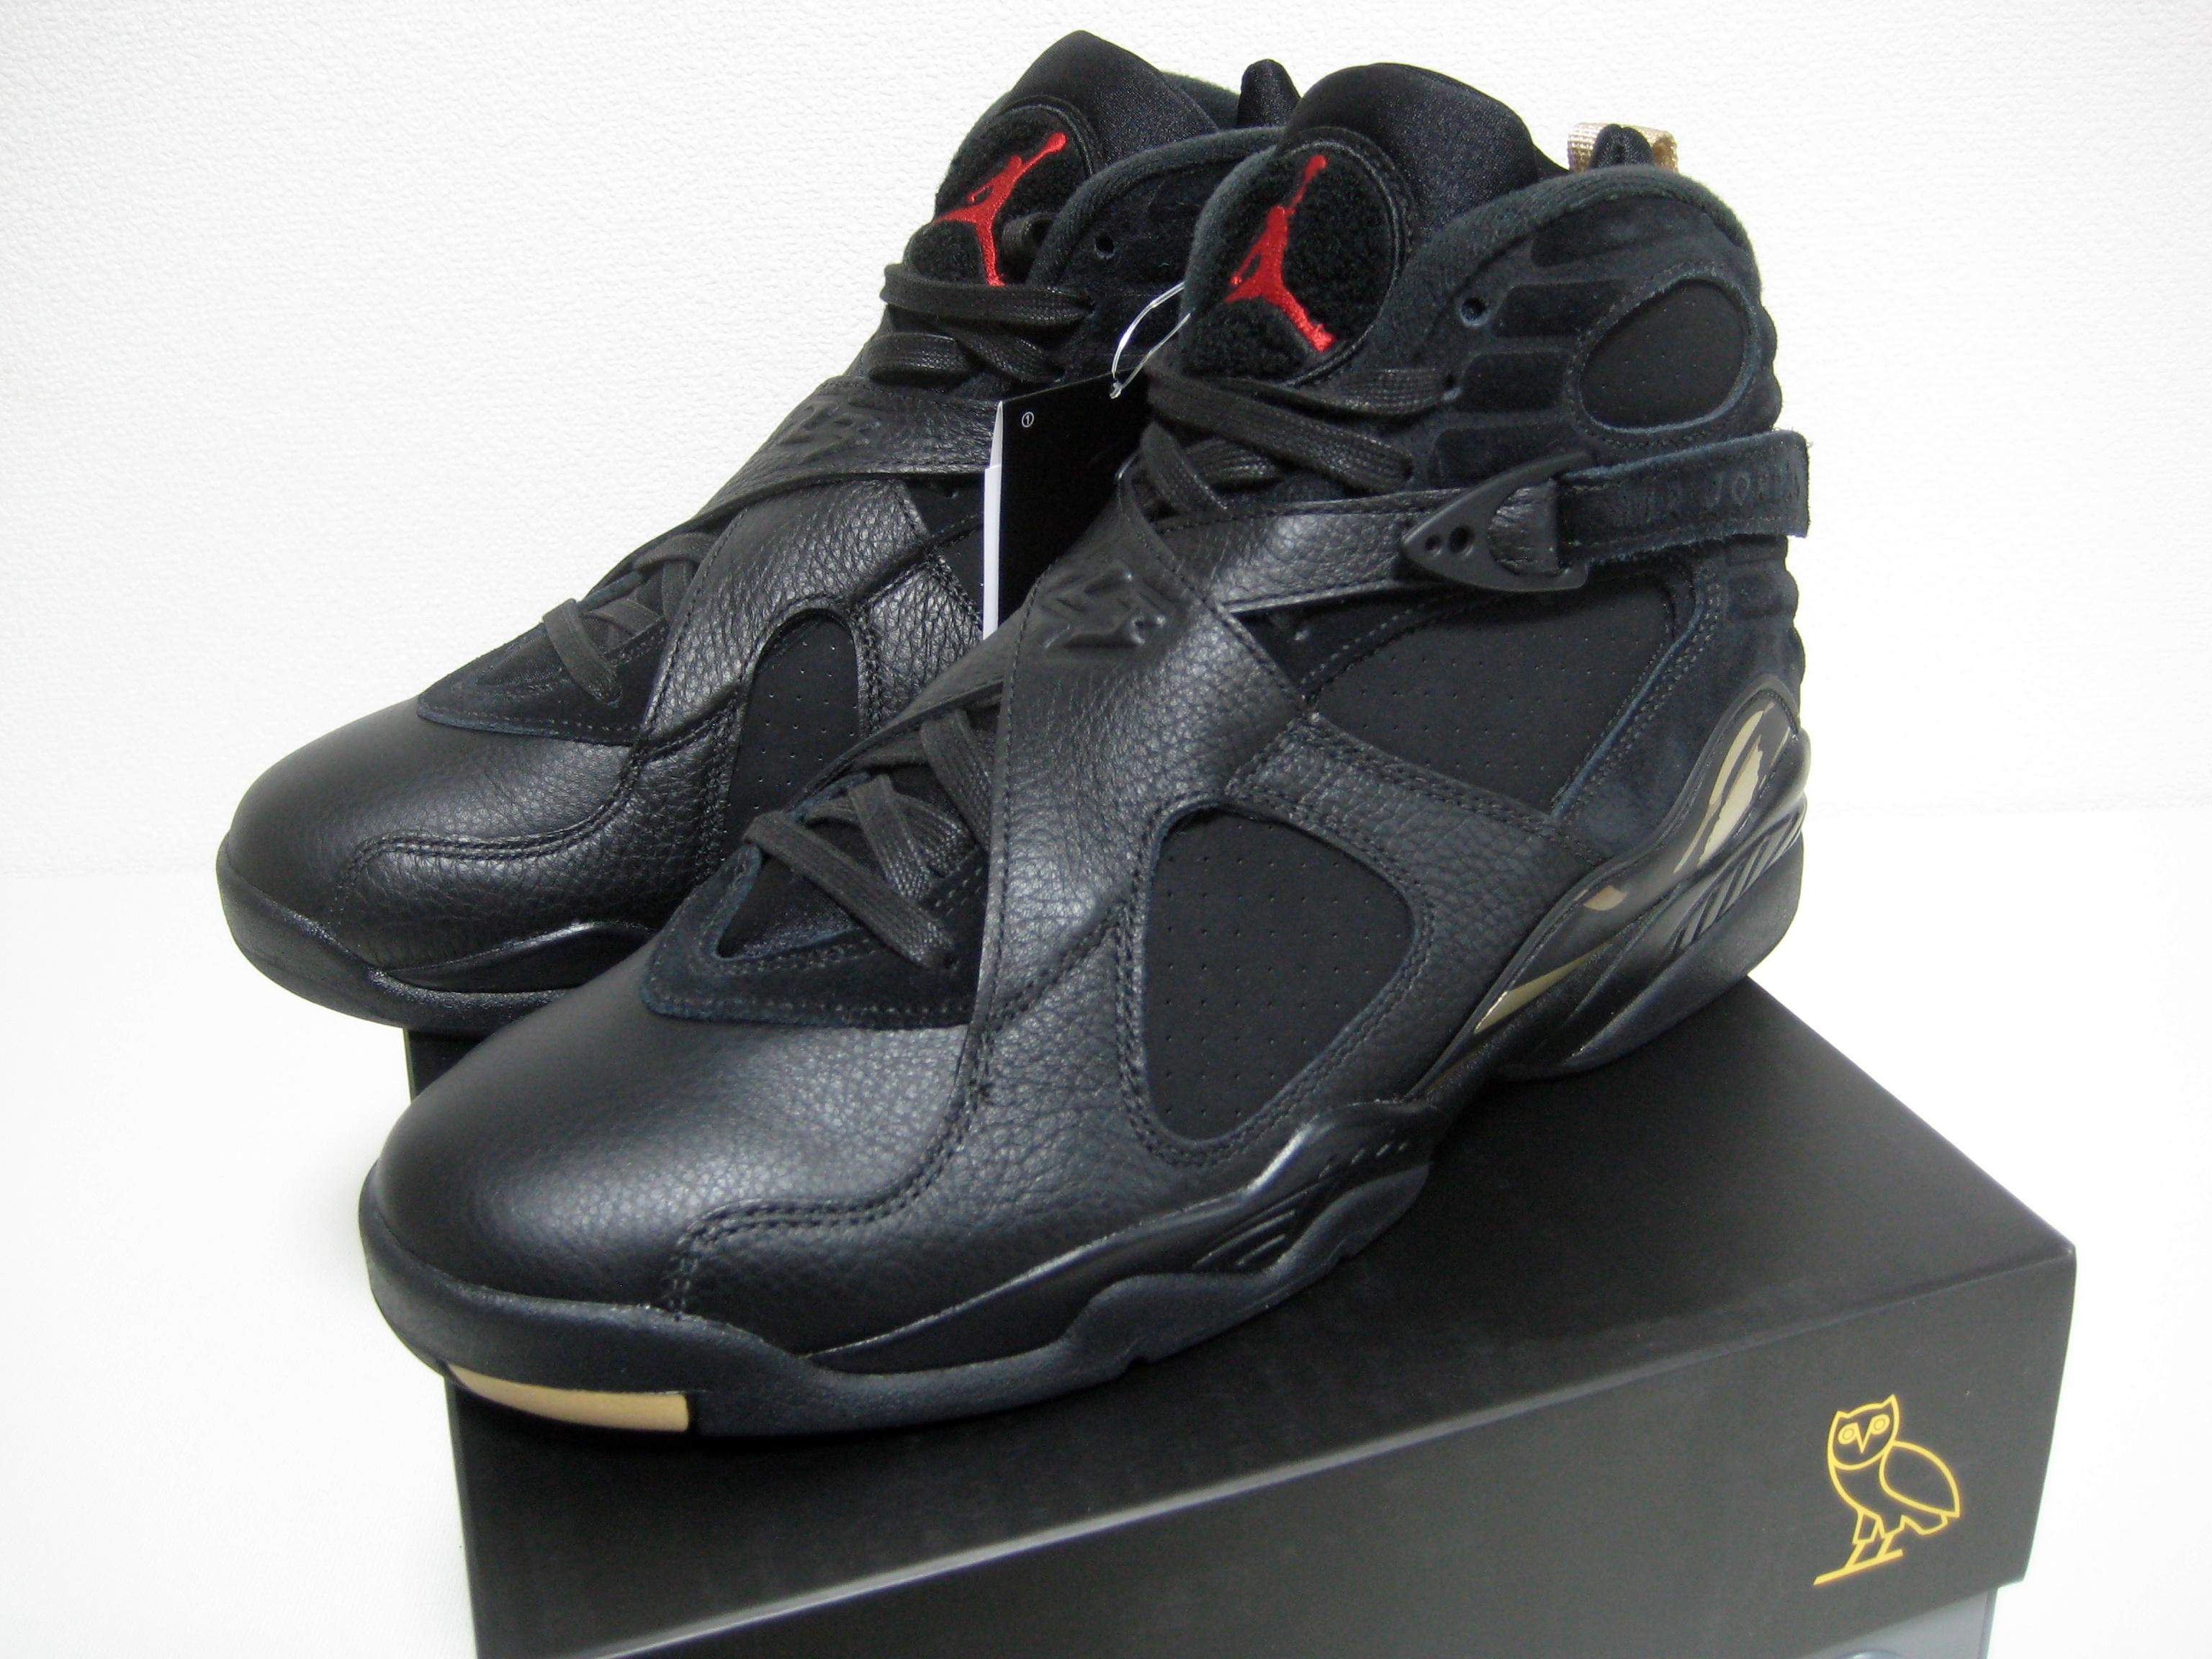 91430ce04fadc5 Jordan Brand NIKE AIR JORDAN 8 VIII RETRO OVO black US10 brand new ...